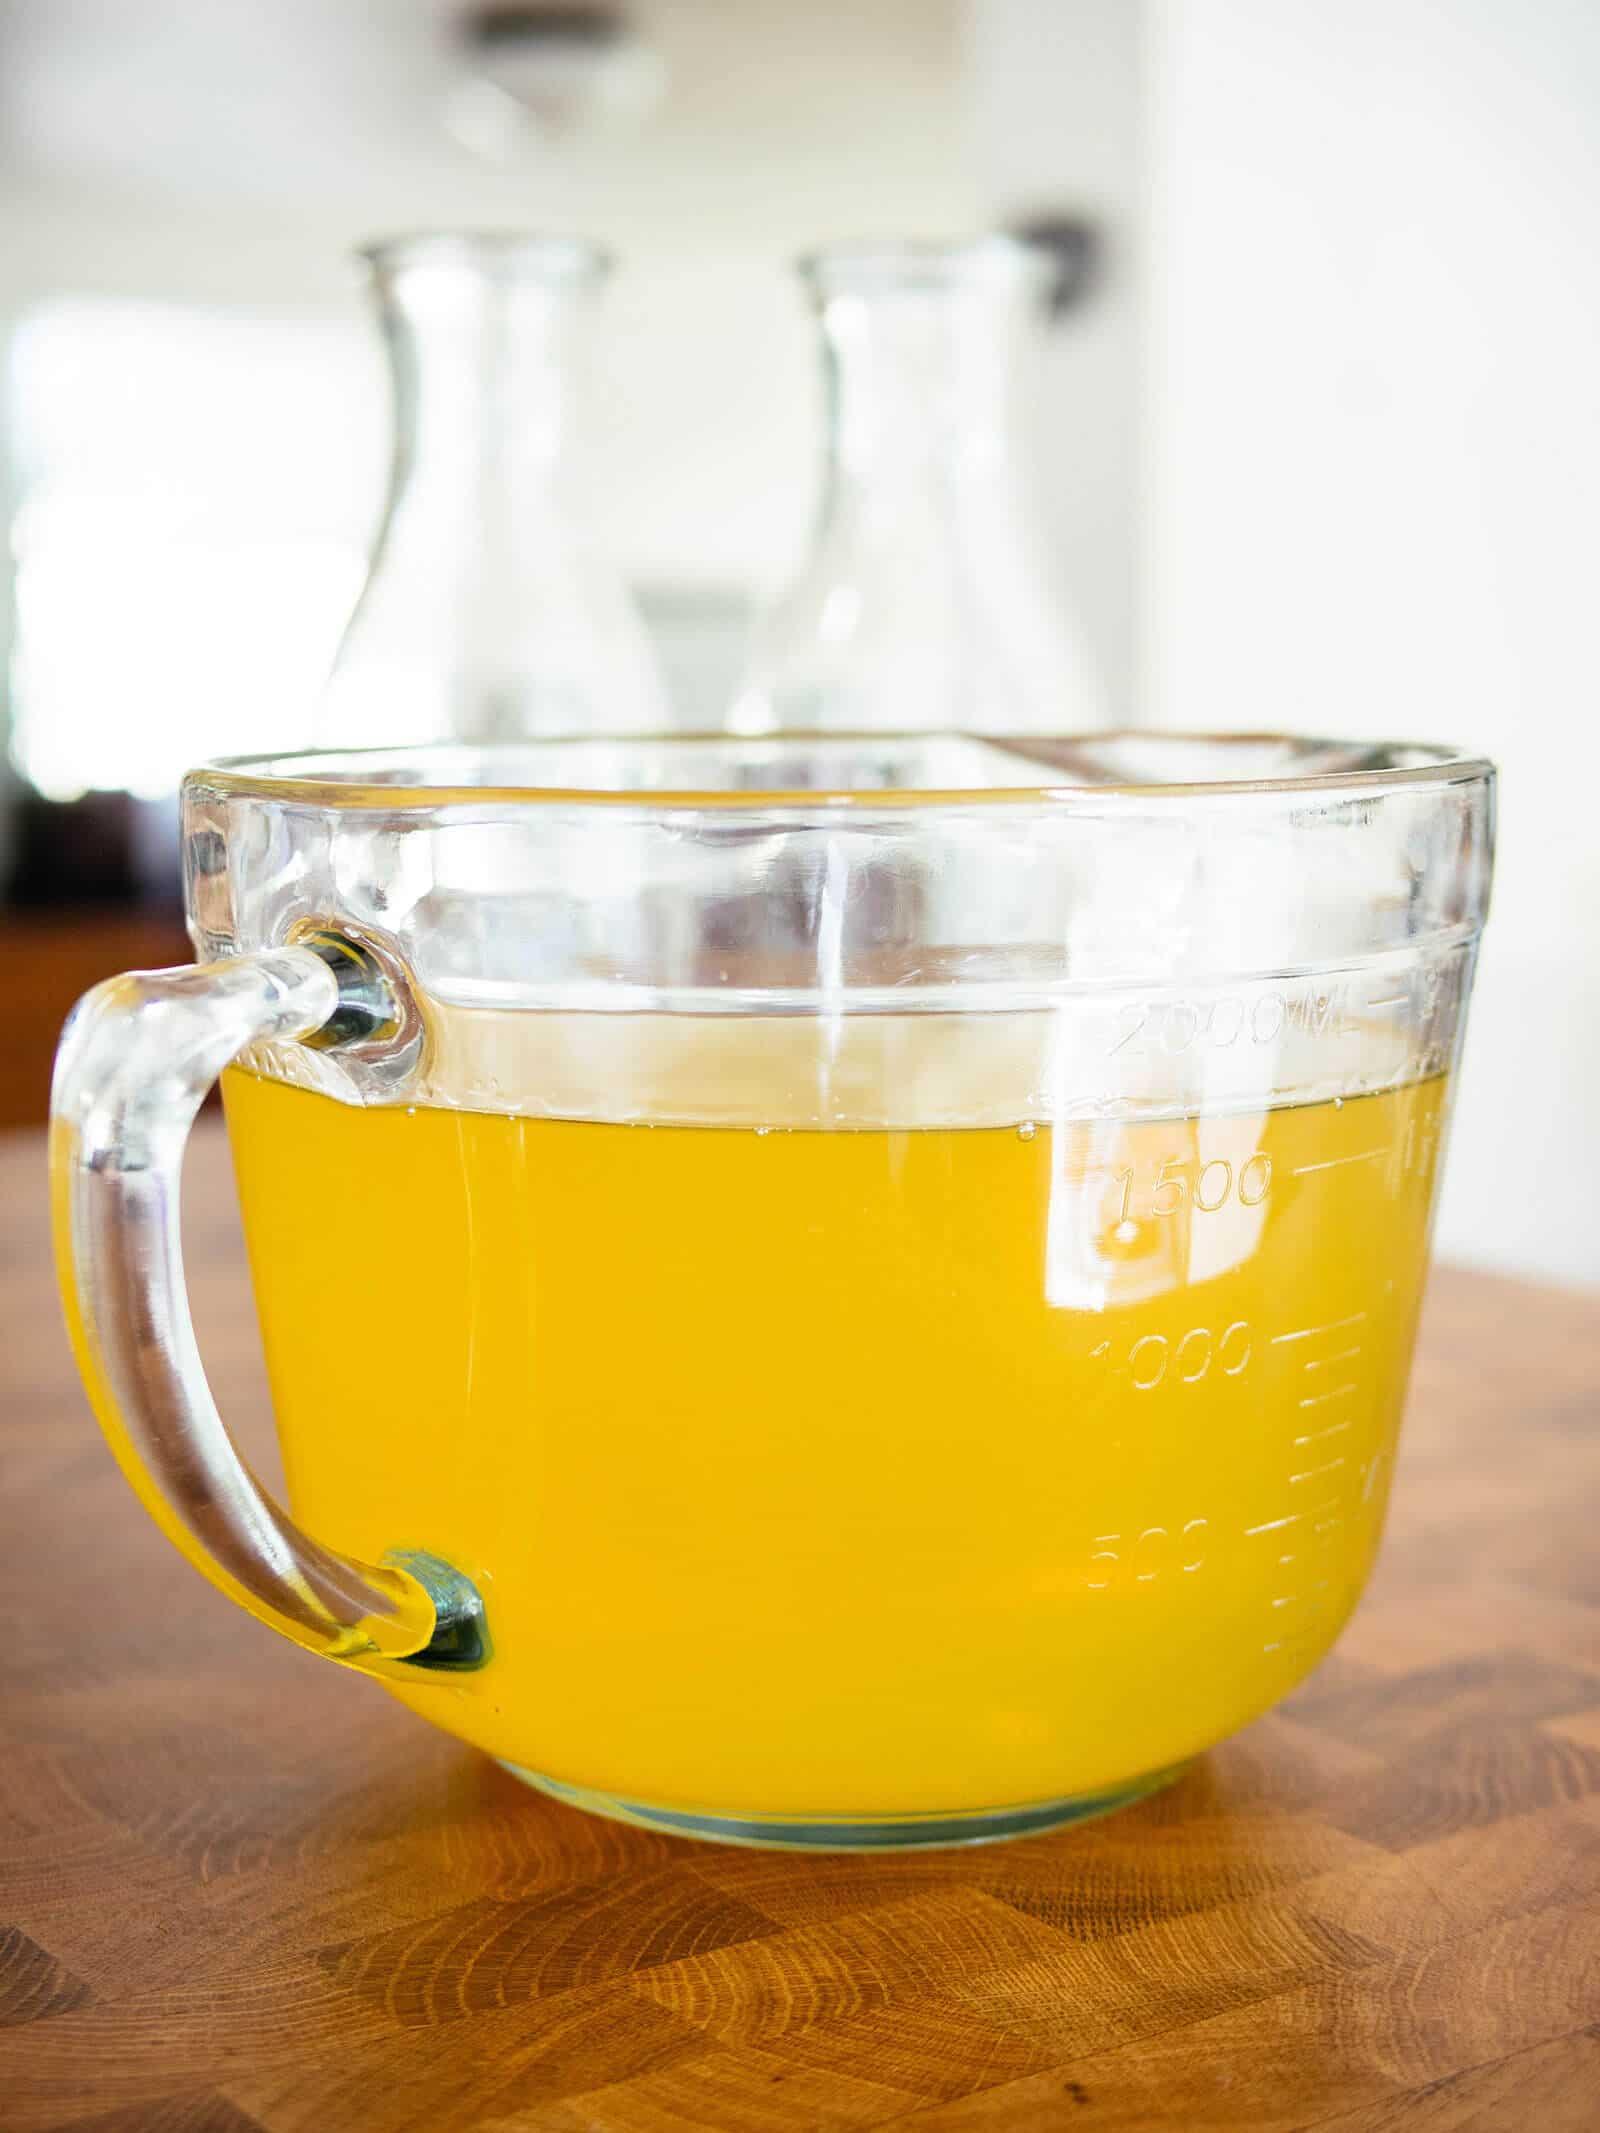 Bowl of bright yellow lemon-infused grain alcohol